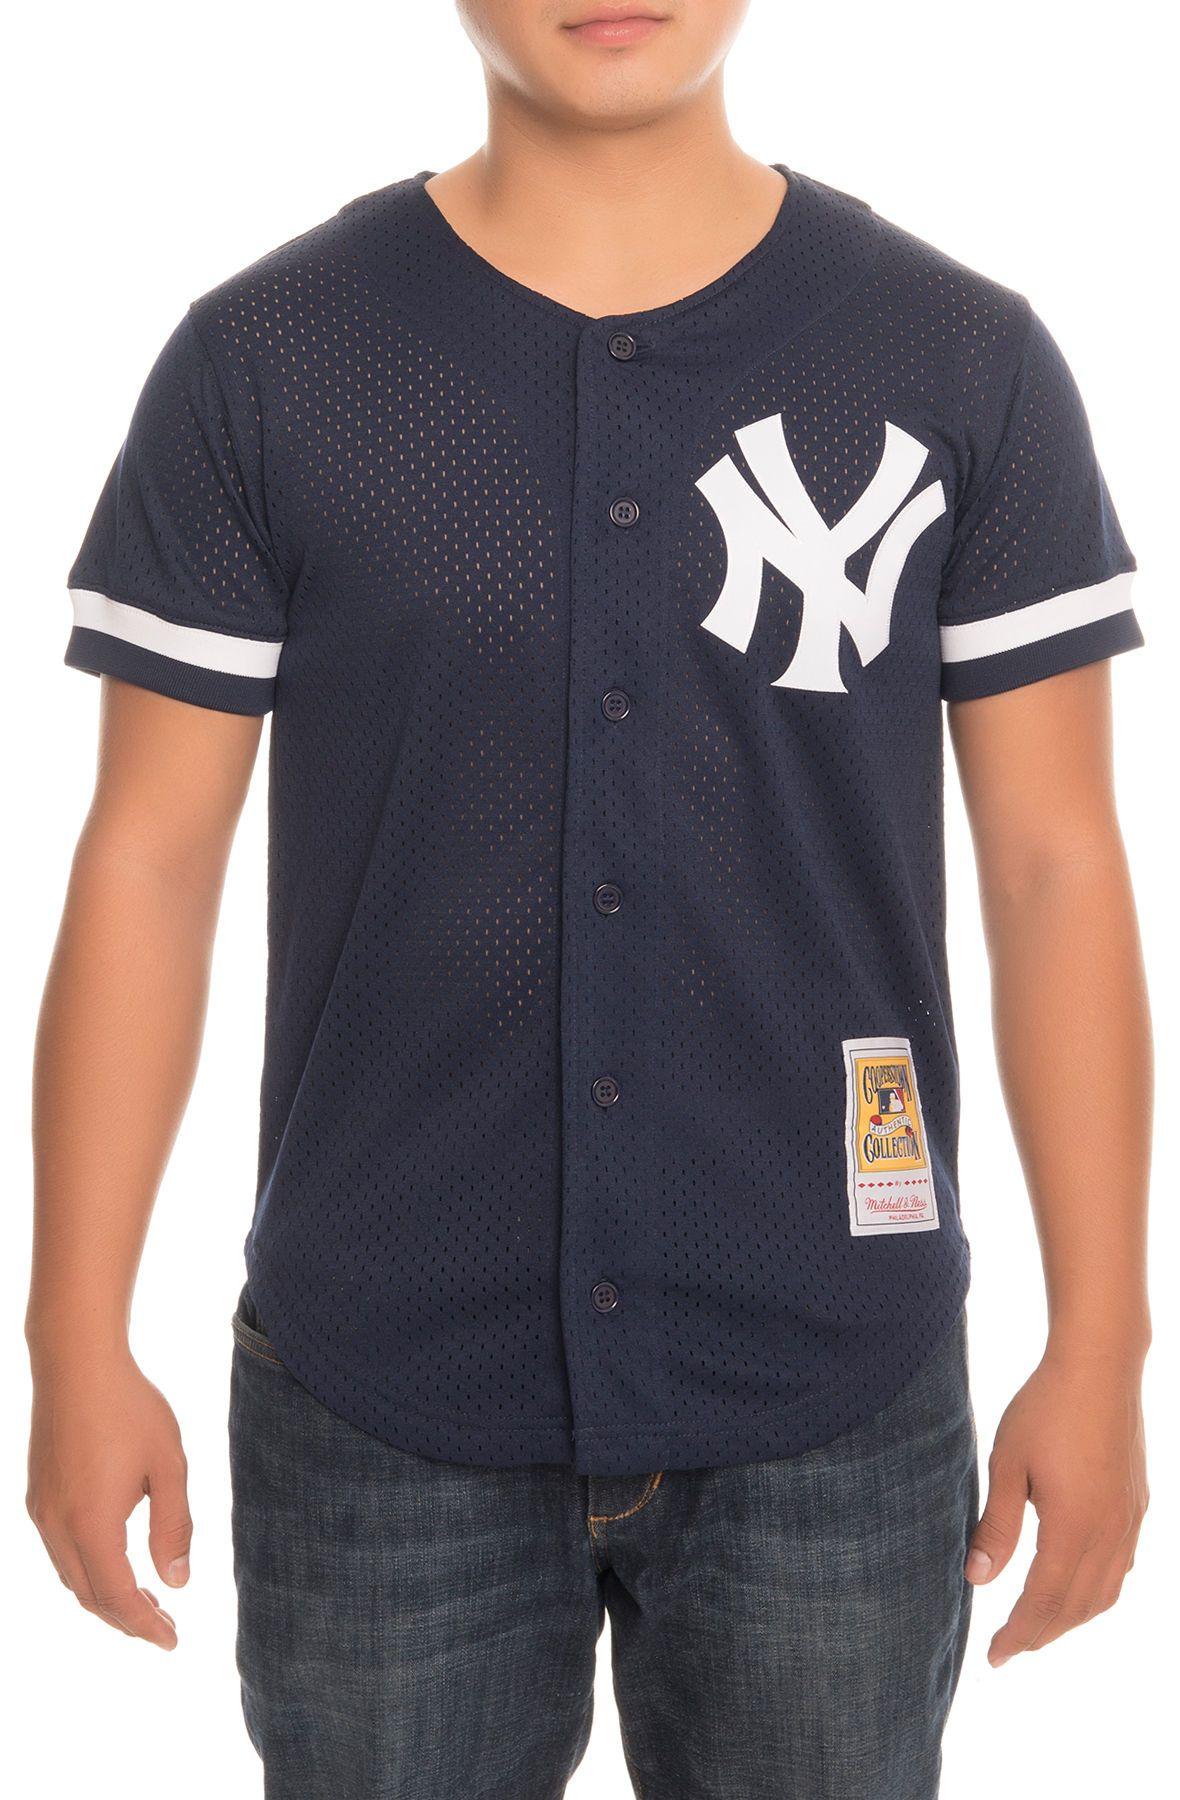 reputable site 1bee2 d2552 new york yankees practice jersey